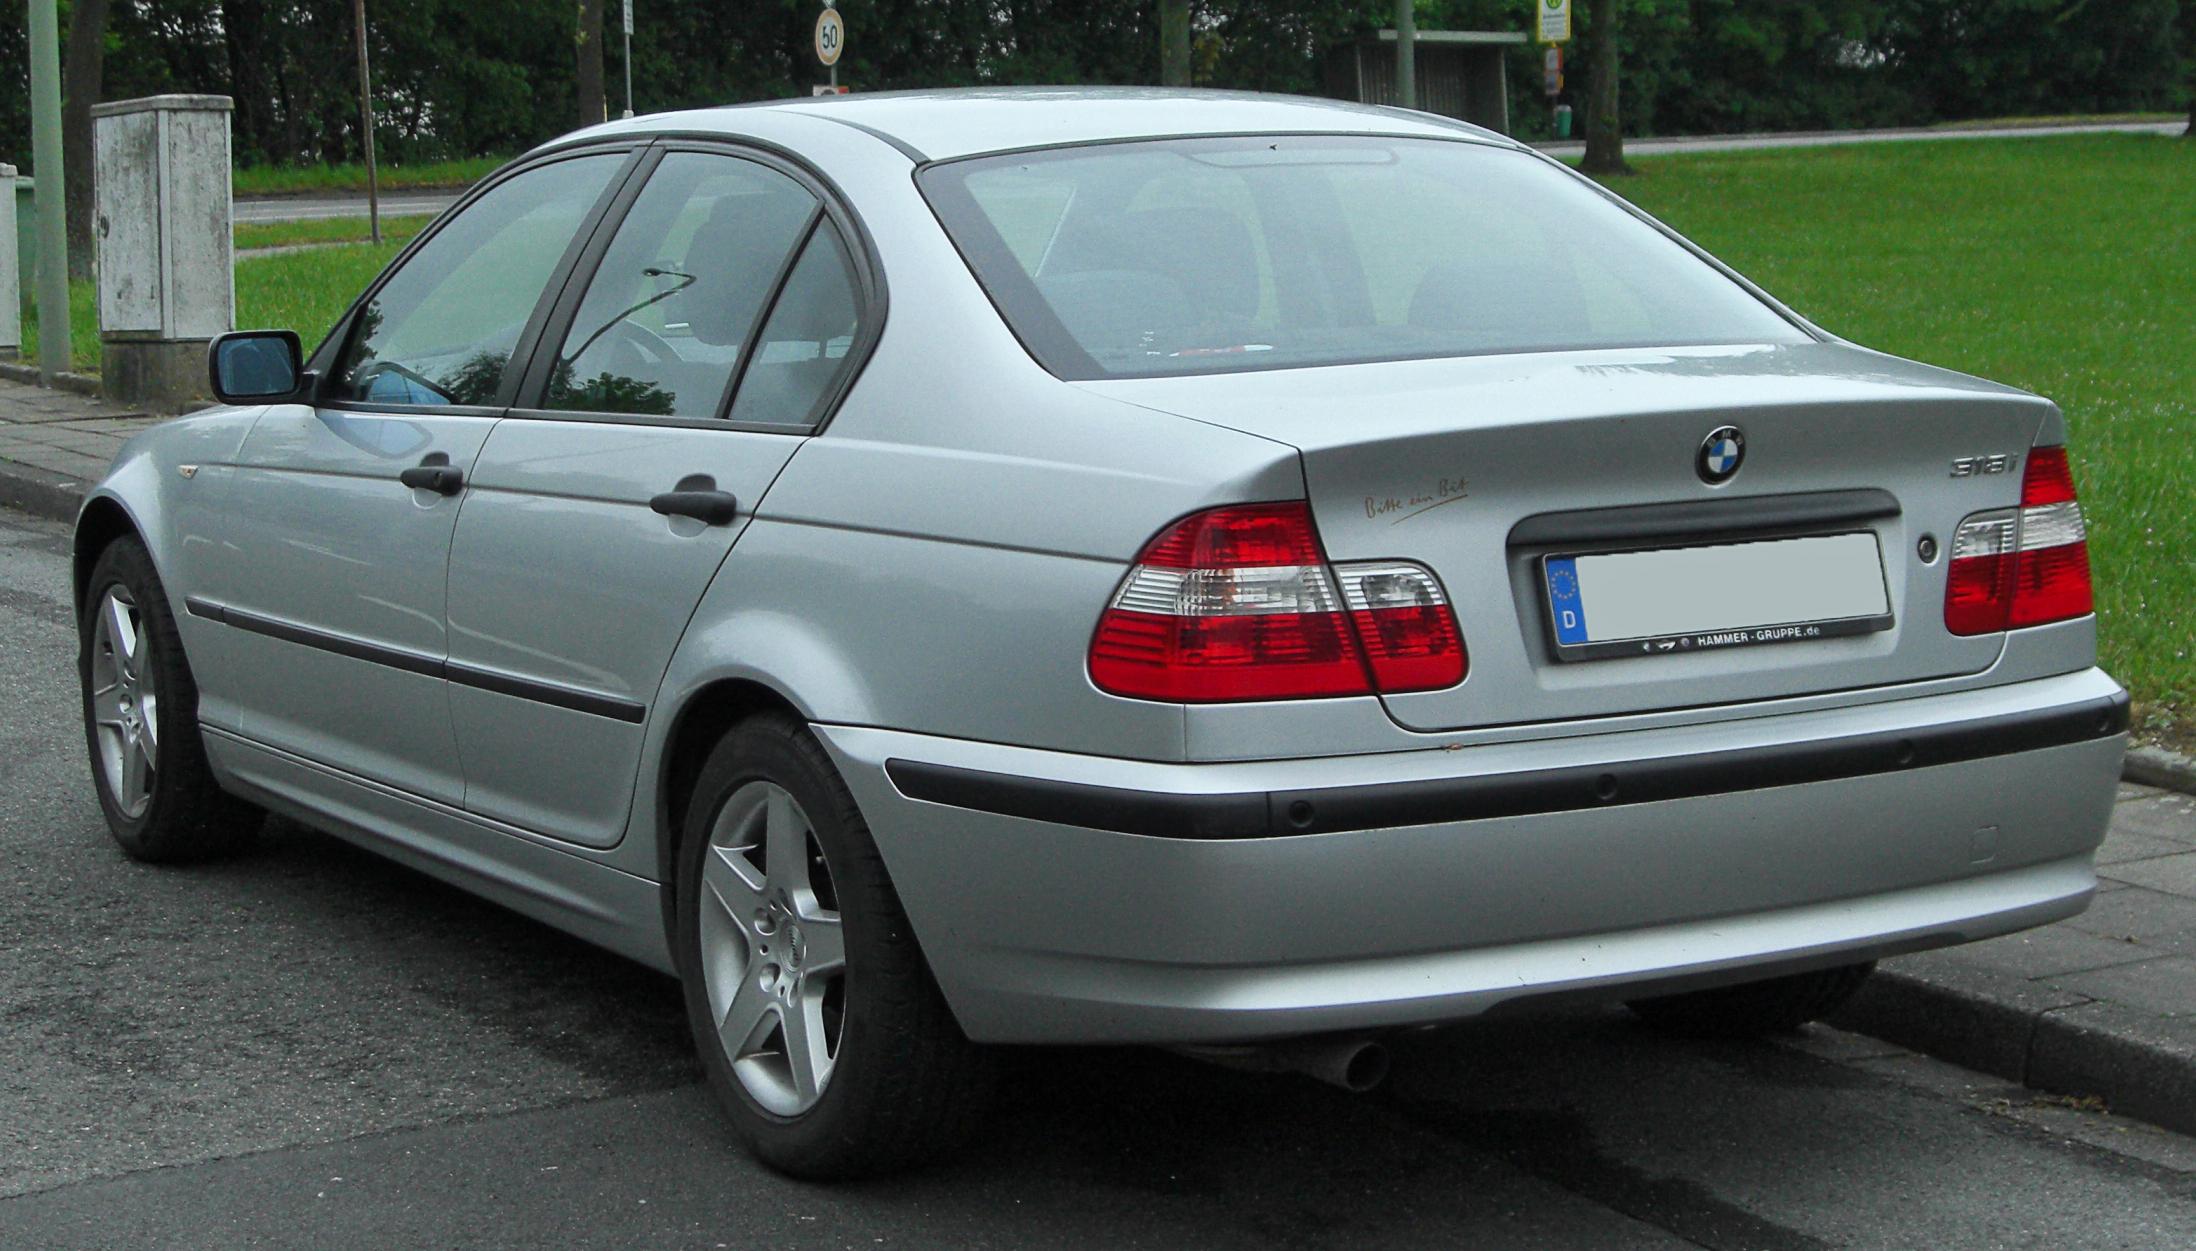 File:BMW 318i (E46) Facelift rear 20100507.jpg - Wikimedia ...